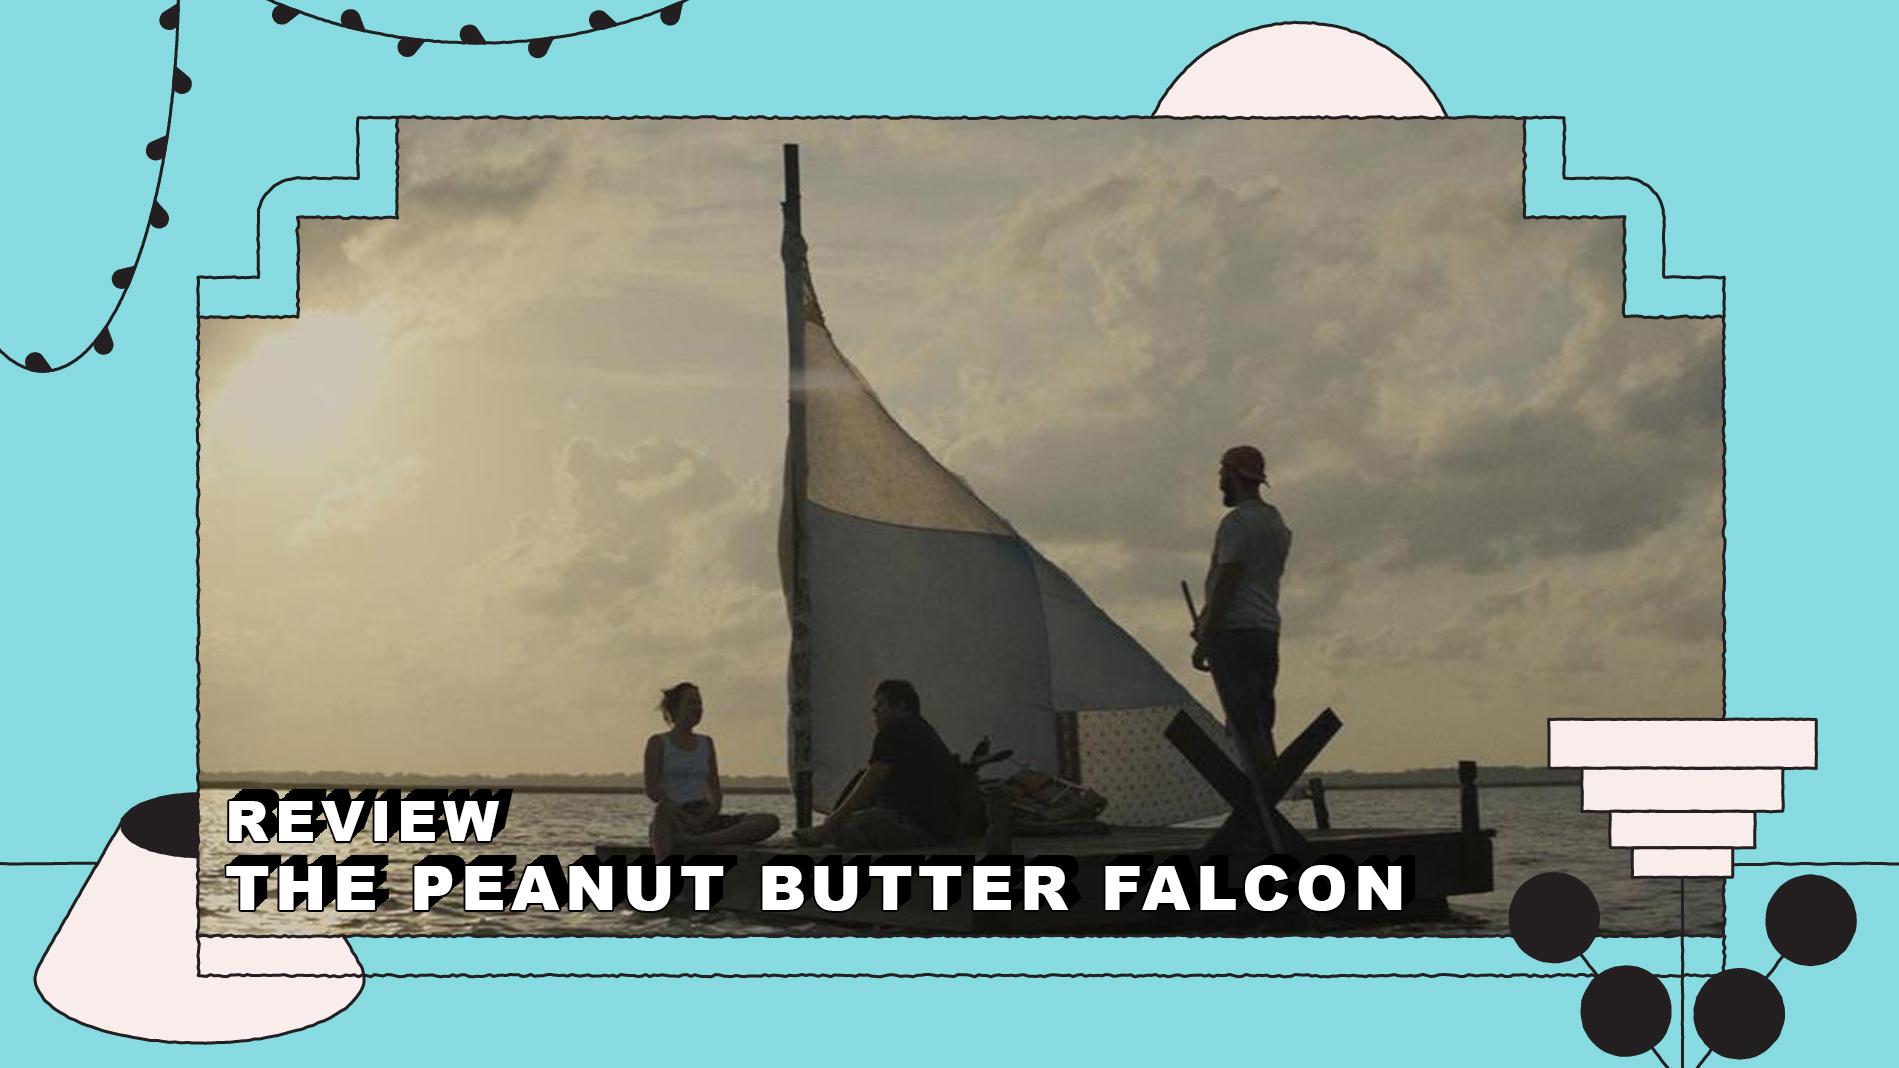 Peanut butter Falcon Cover Image.jpg